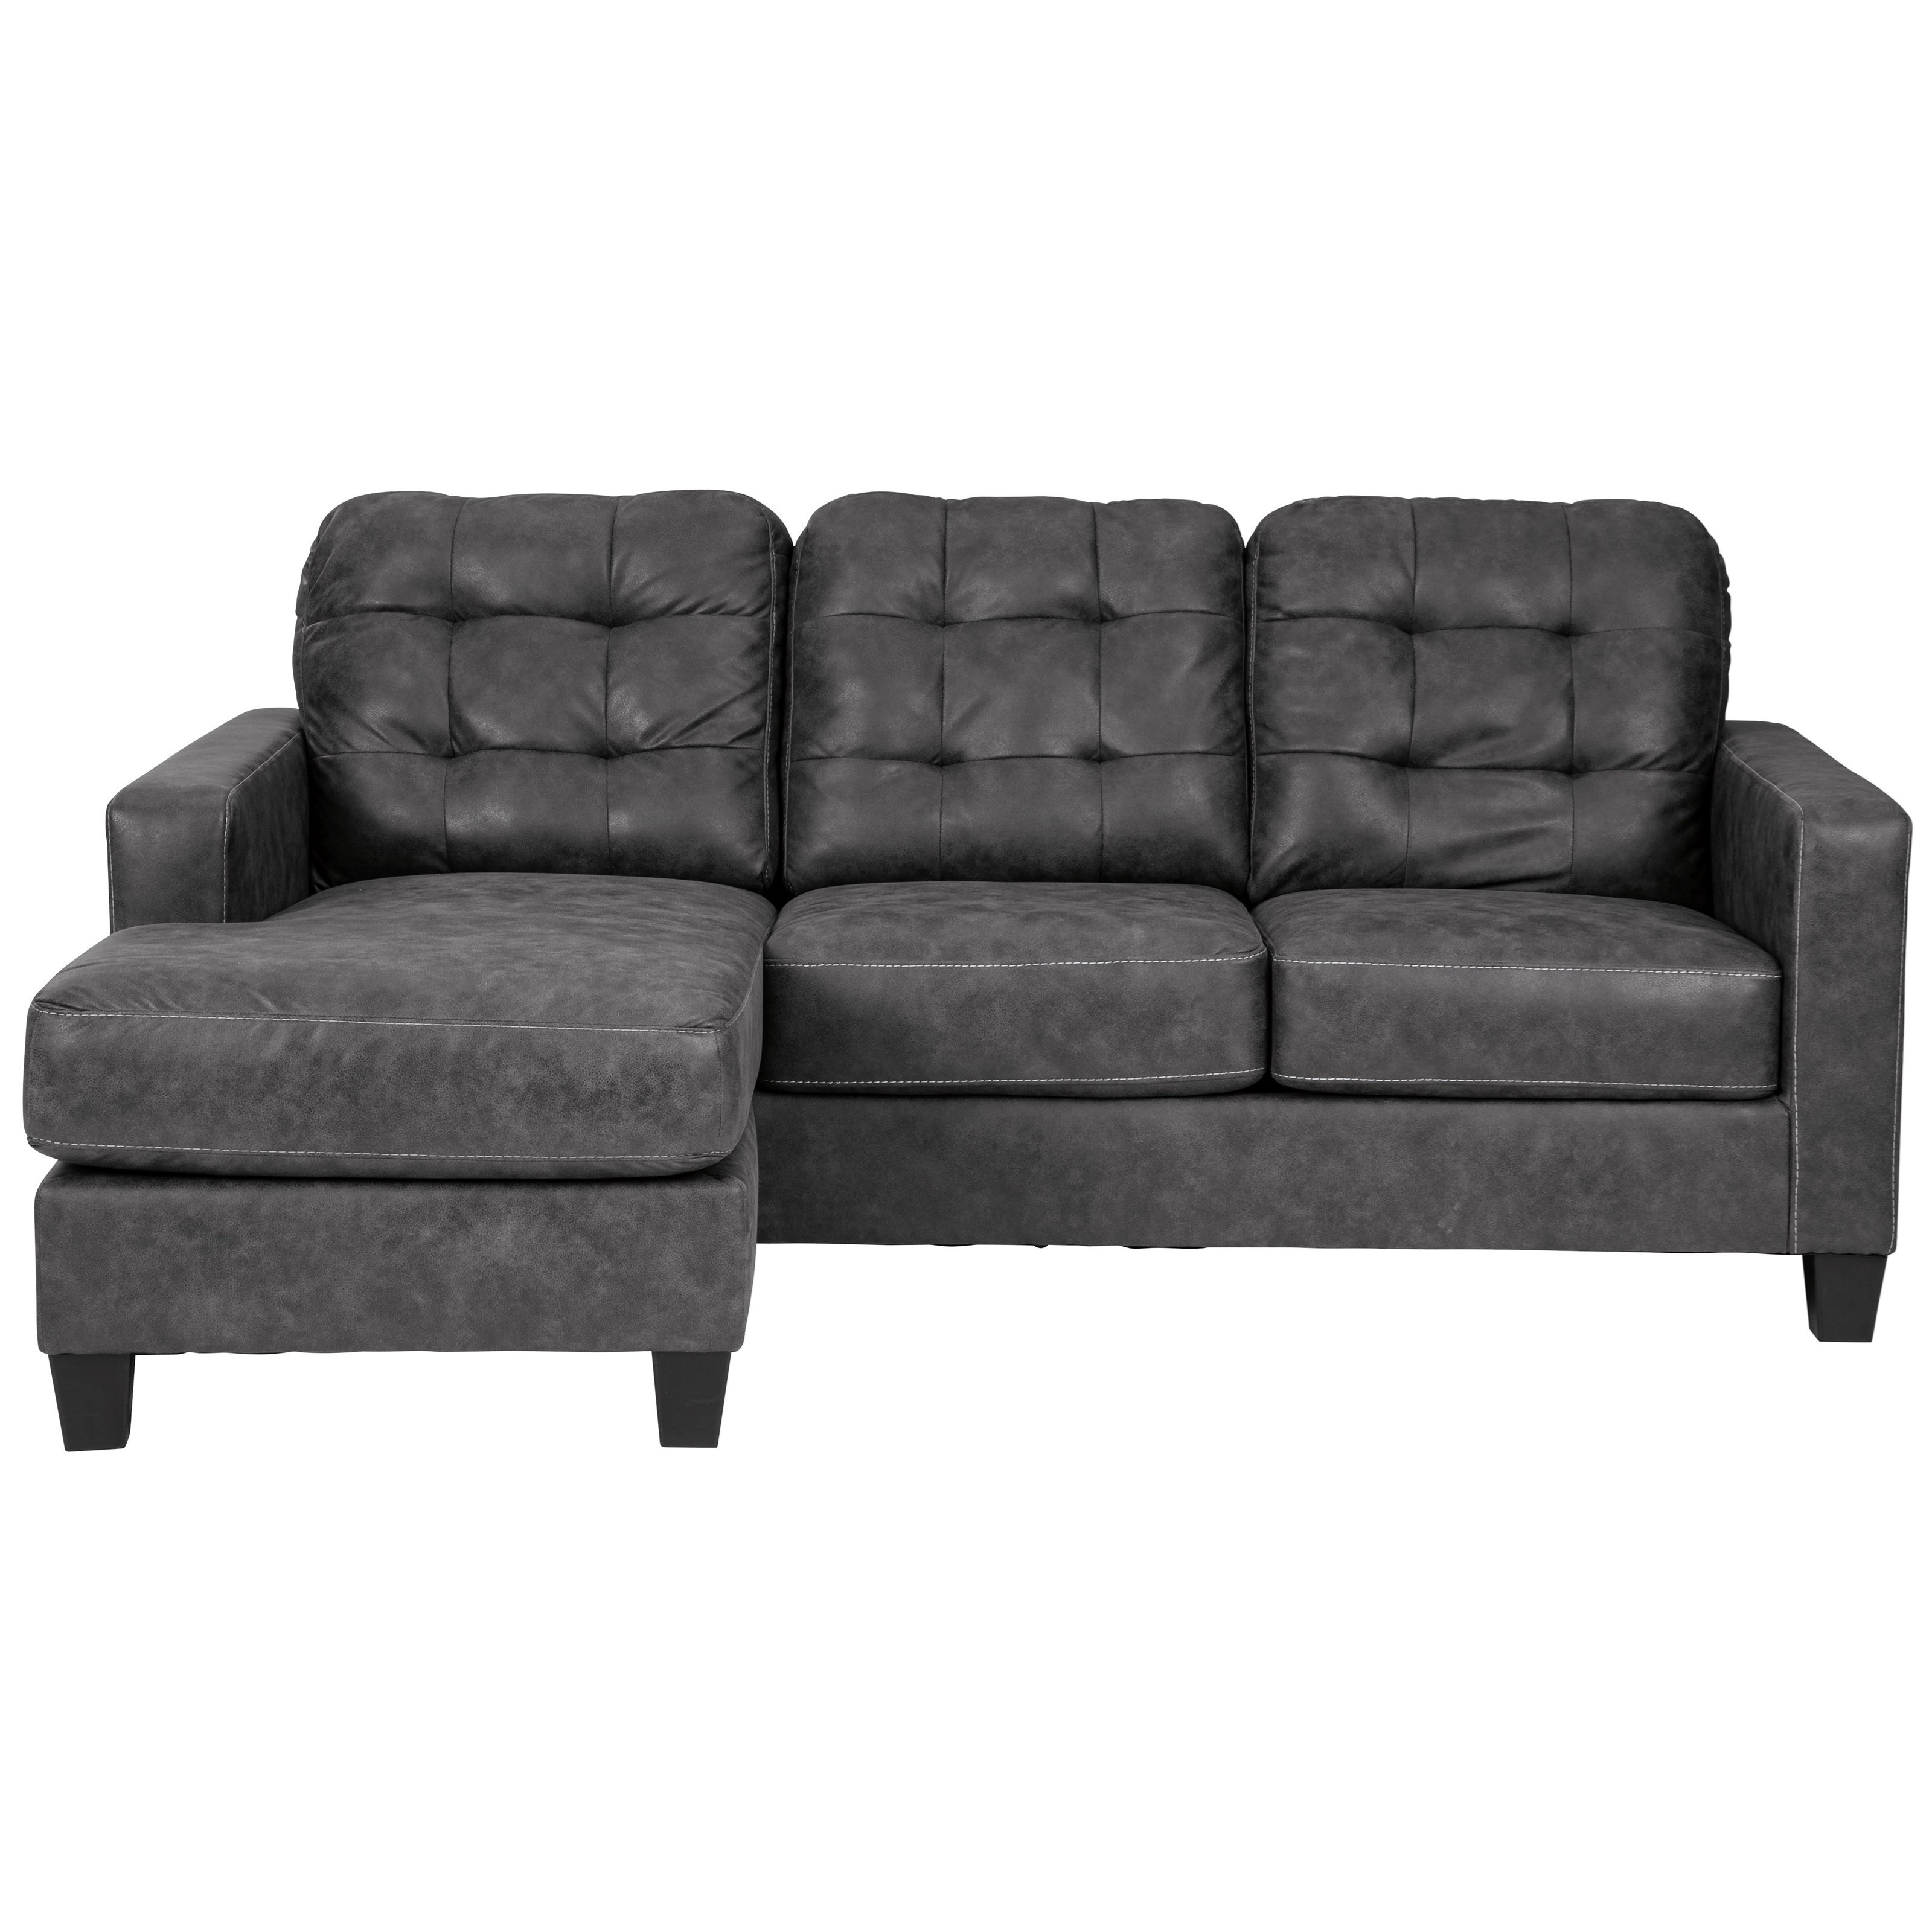 Venaldi Queen Sleeper Sofa With Chaise